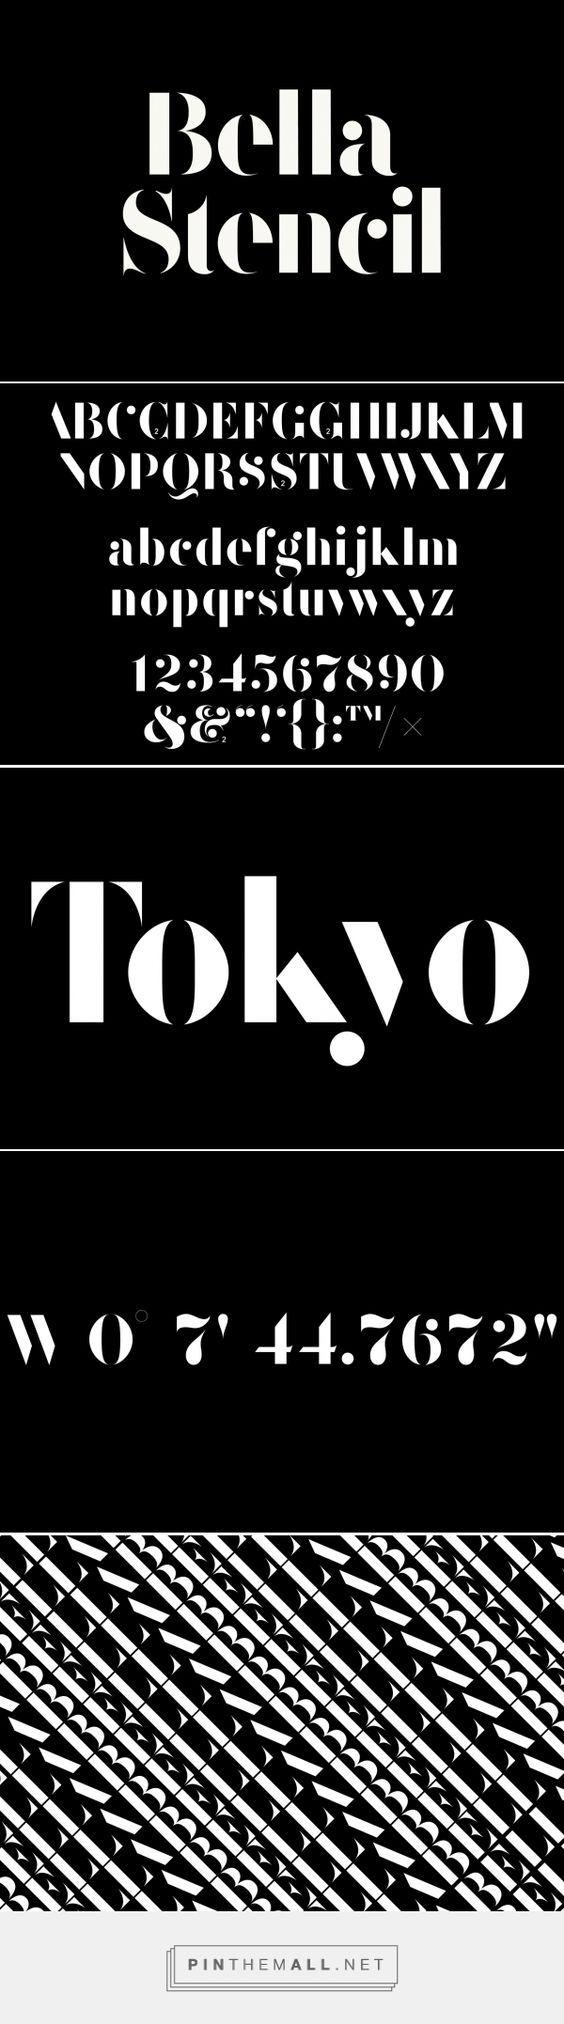 F37 Bella Stencil | Face37 Ltd . Font . Typography: